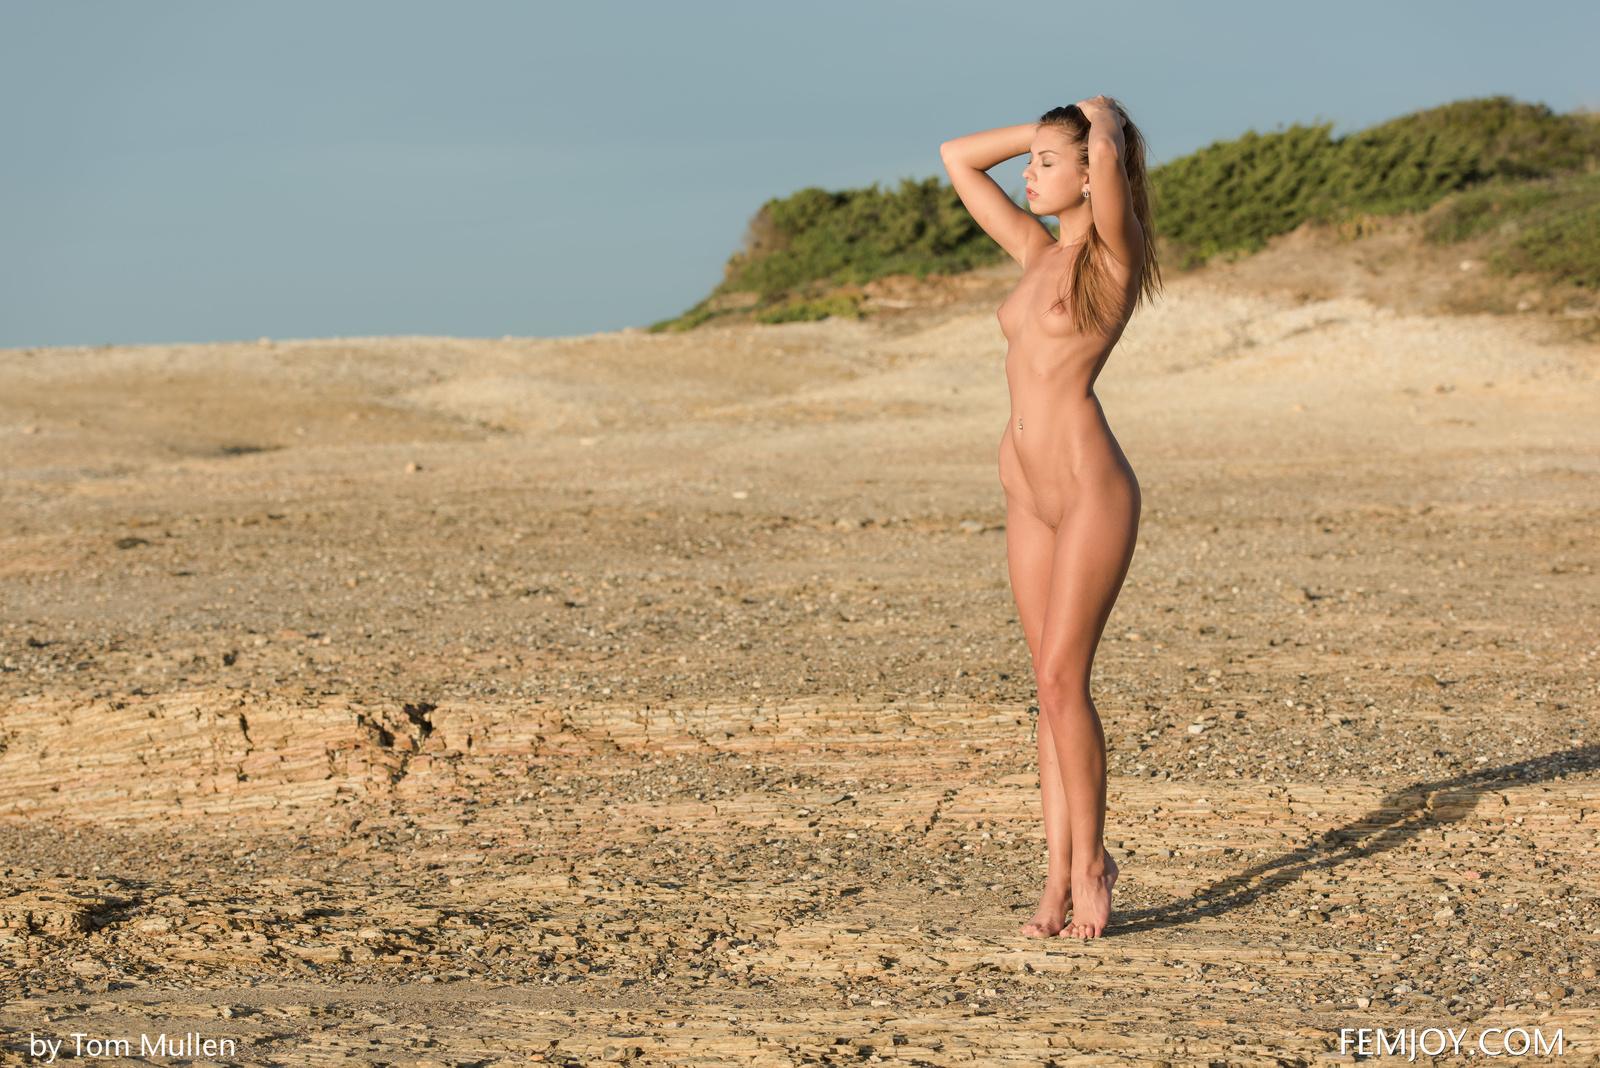 Zdjęcie porno - 1014 - Malutka brunetka na piasku